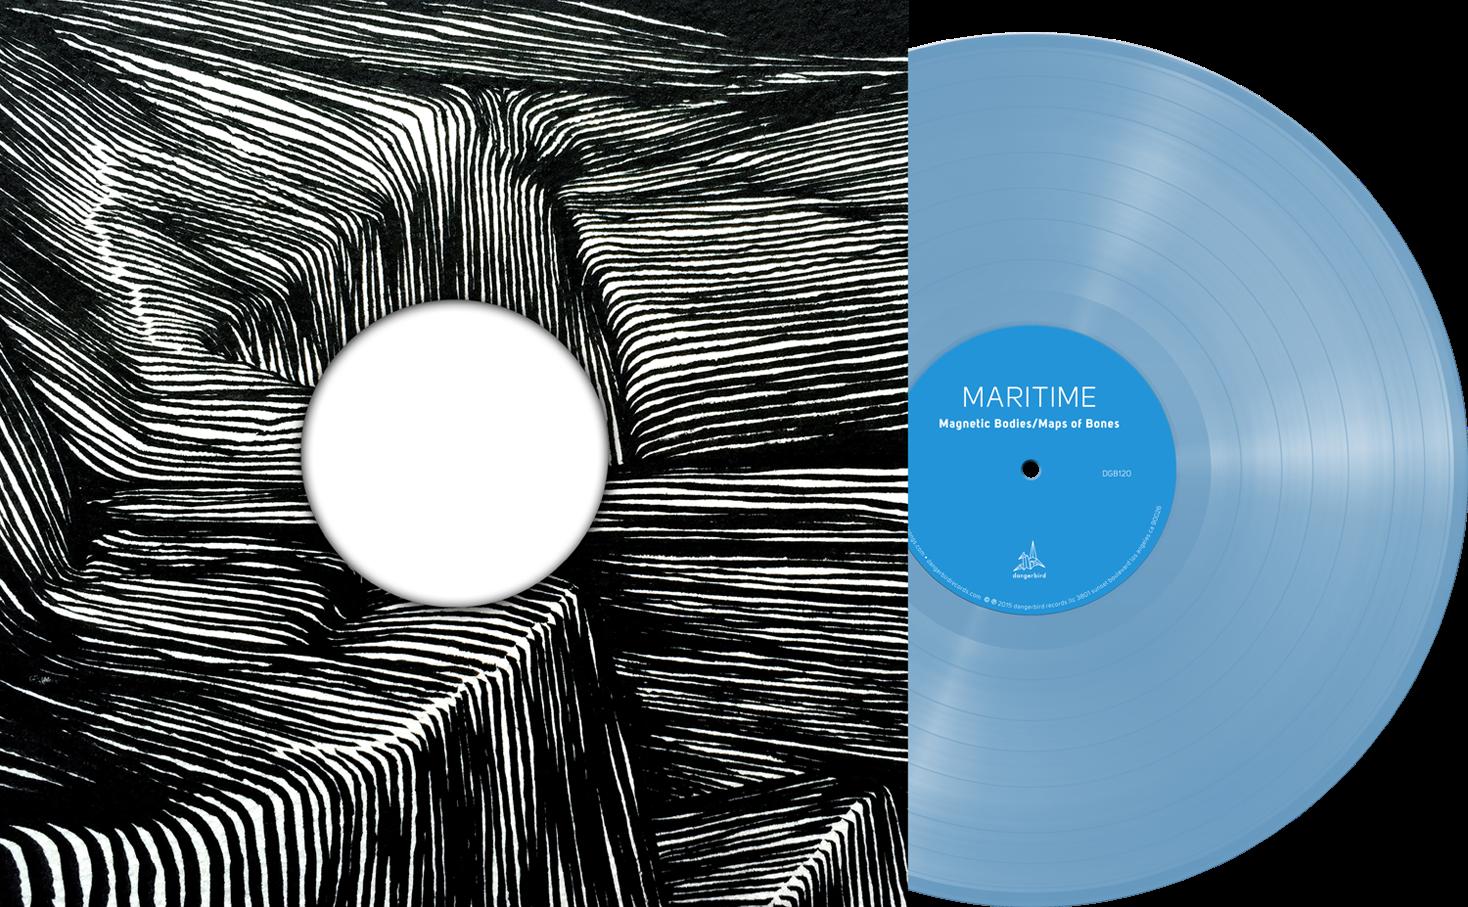 Maritime - Magnetic Bodies/Maps of Bones - Blue Vinyl LP